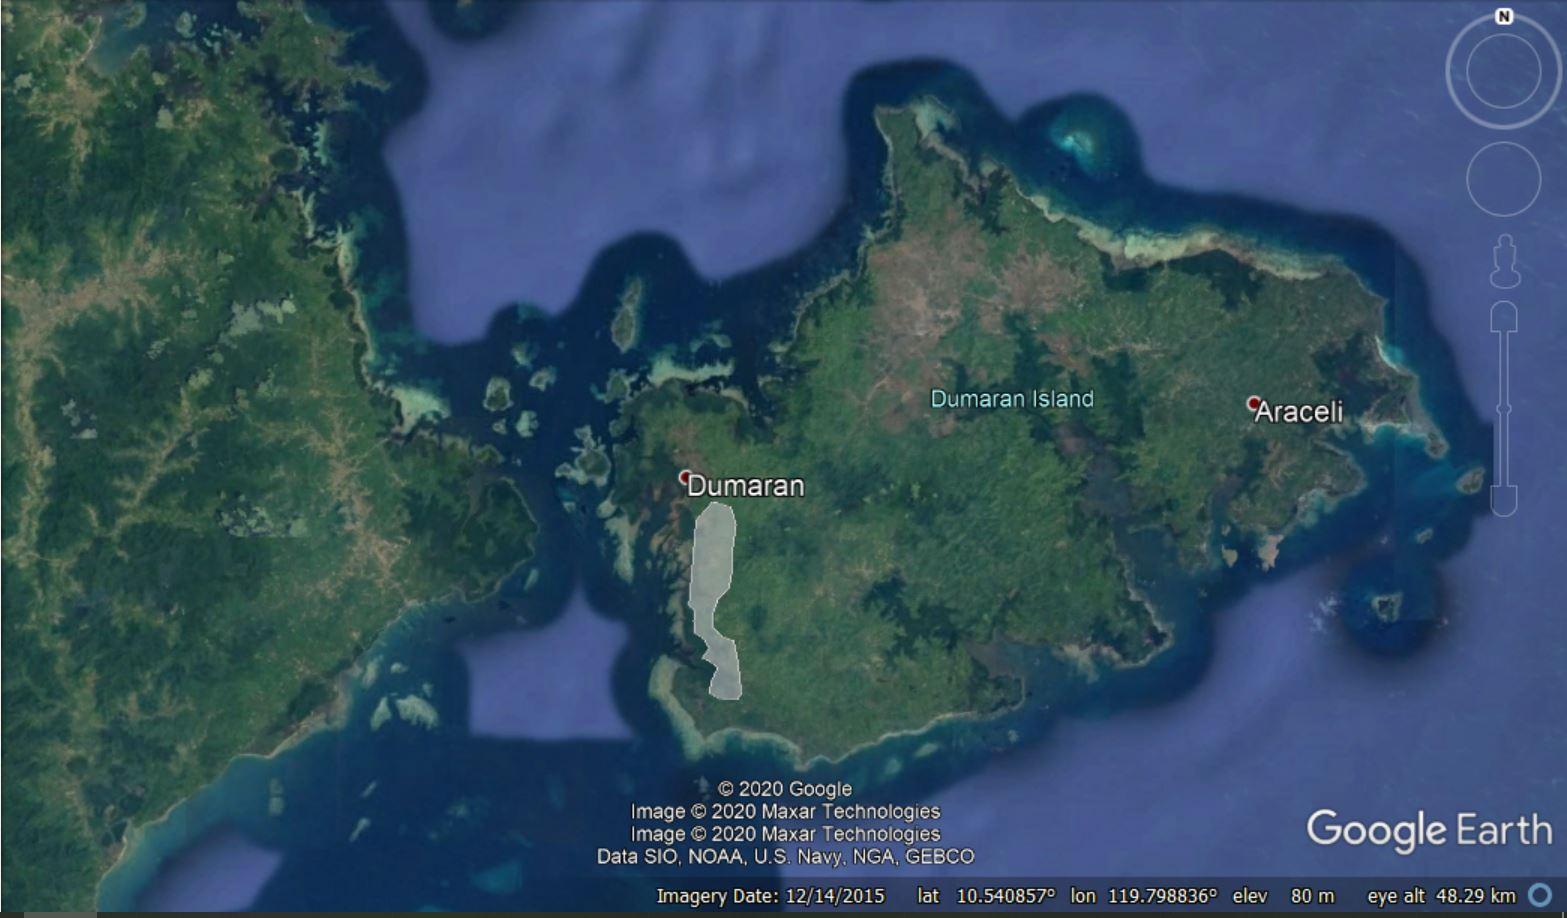 Dumaran Island